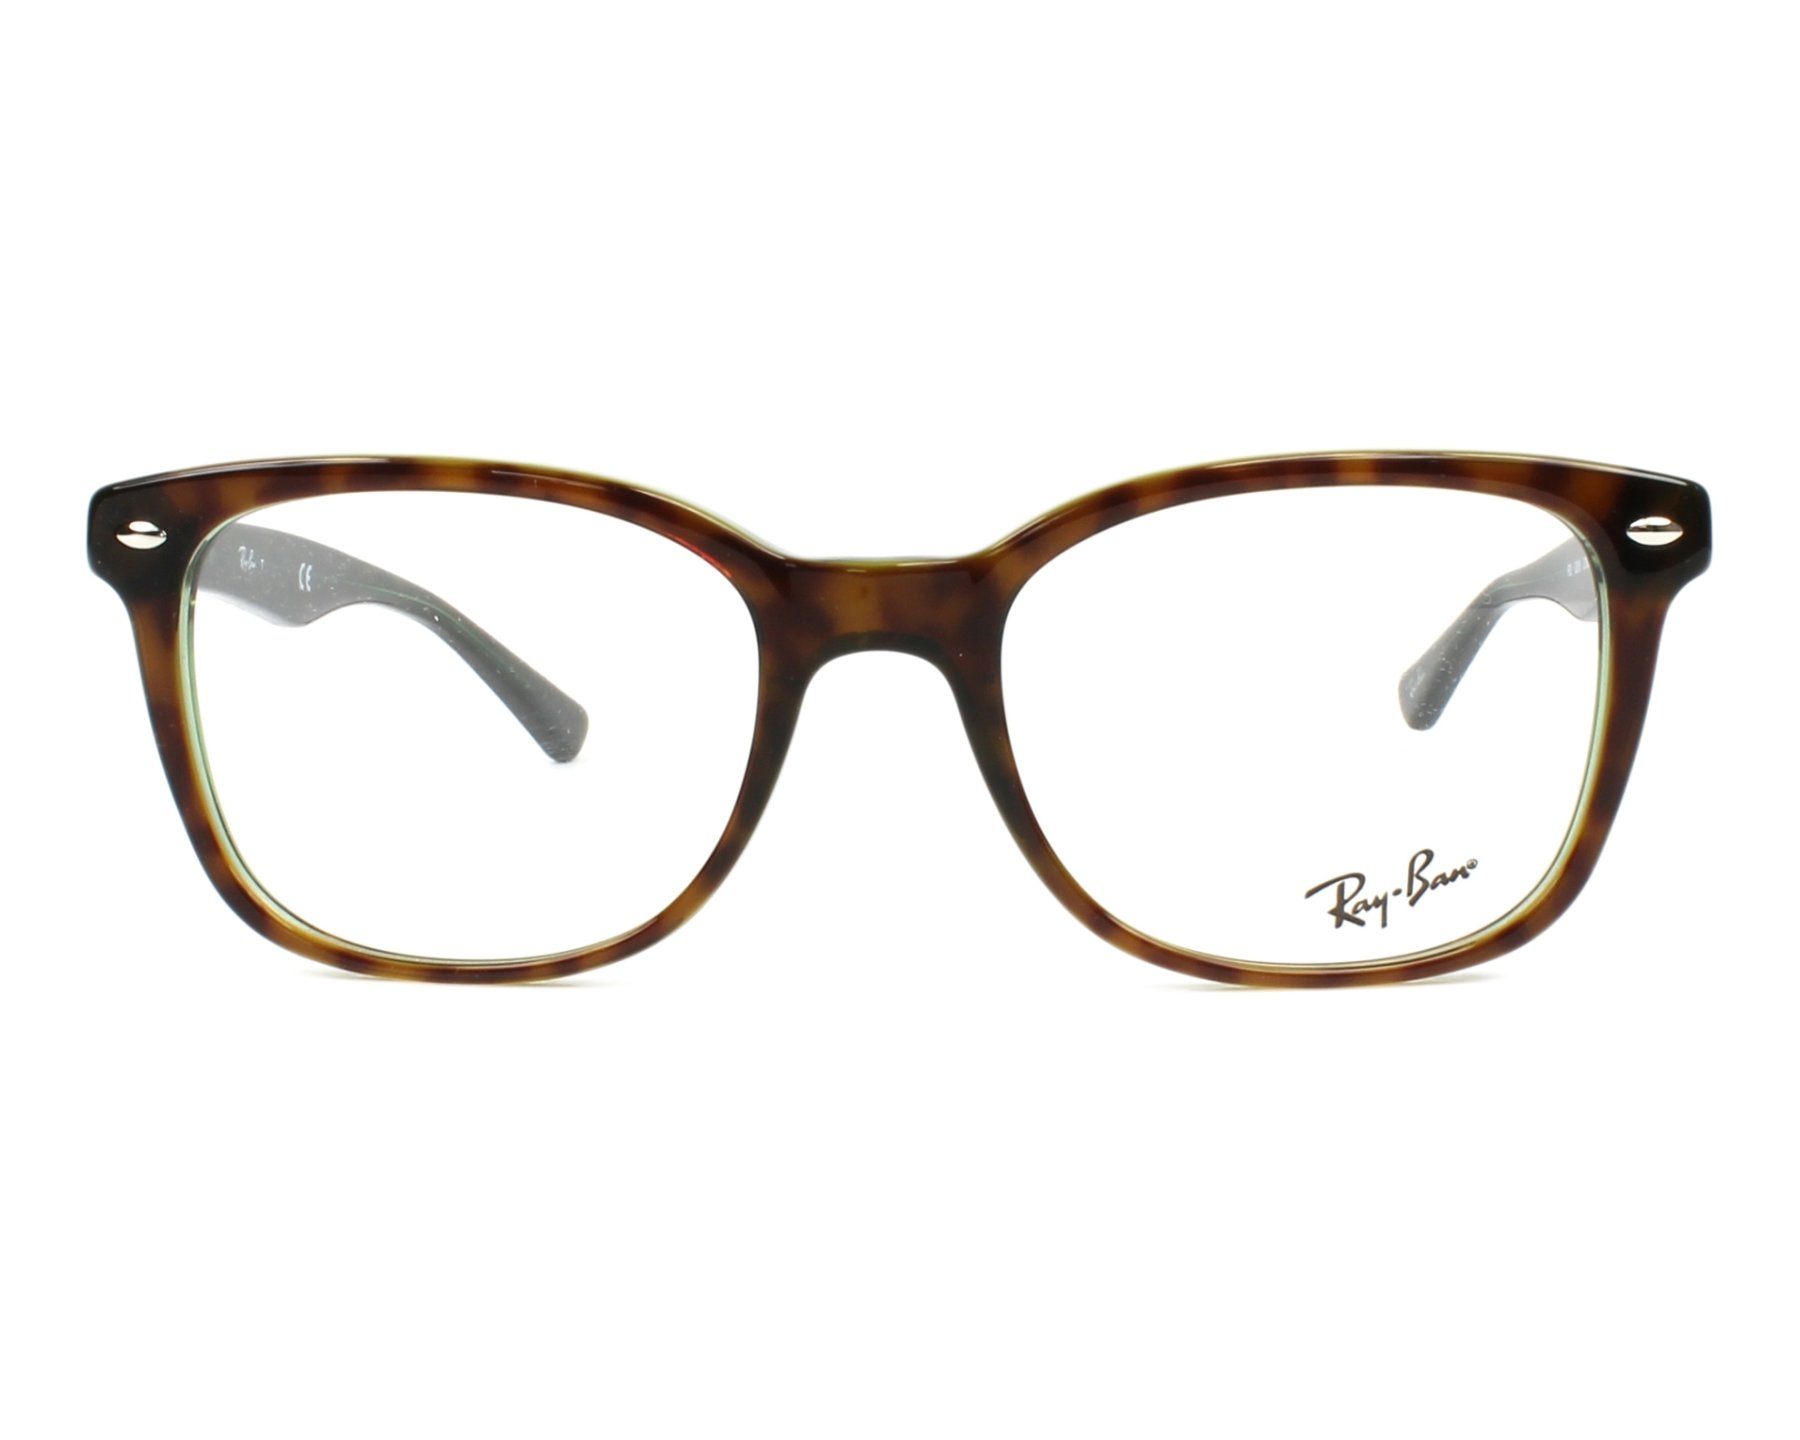 cda655c9670 eyeglasses Ray-Ban RX-5285 2383 53-19 Havana Green front view